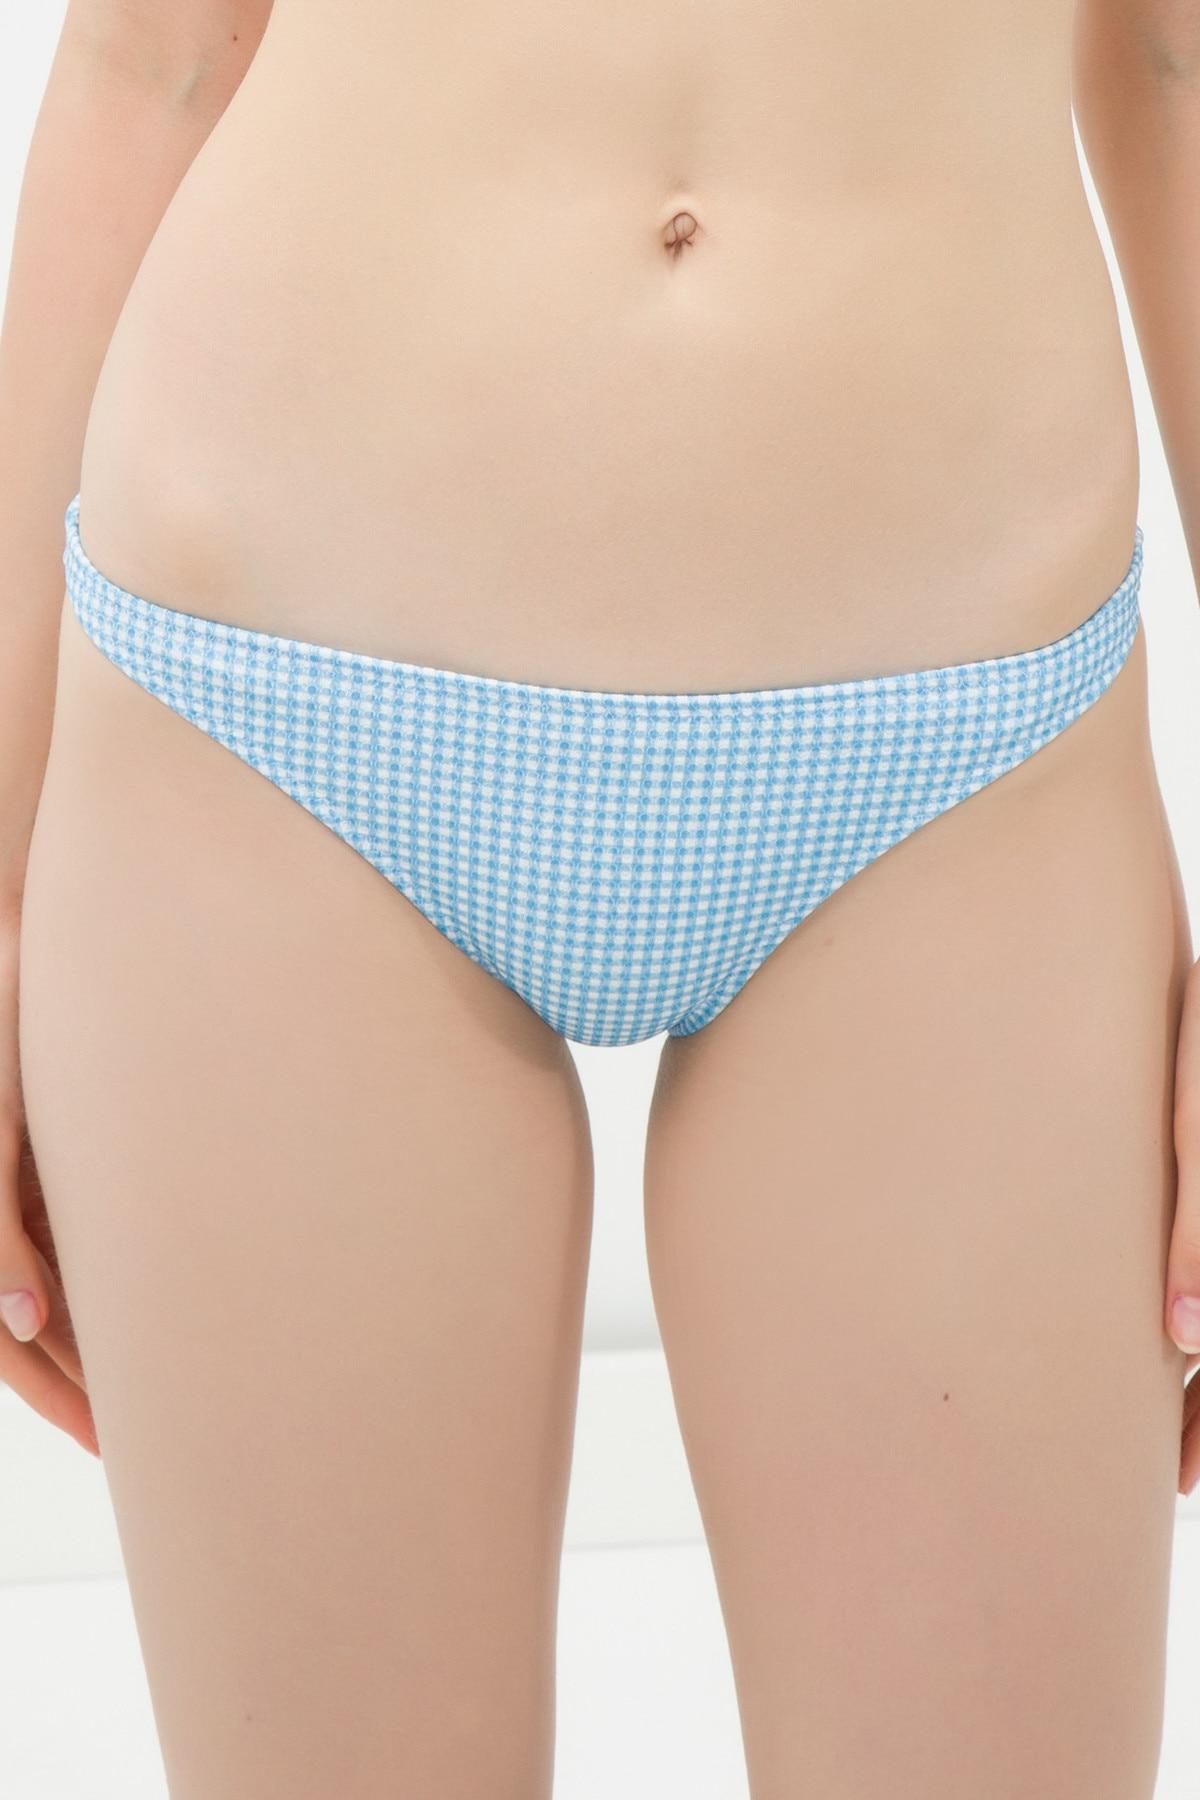 Bikini Koton de mujer, mezcla azul, parte inferior de Bikini 6 YAK88830GM